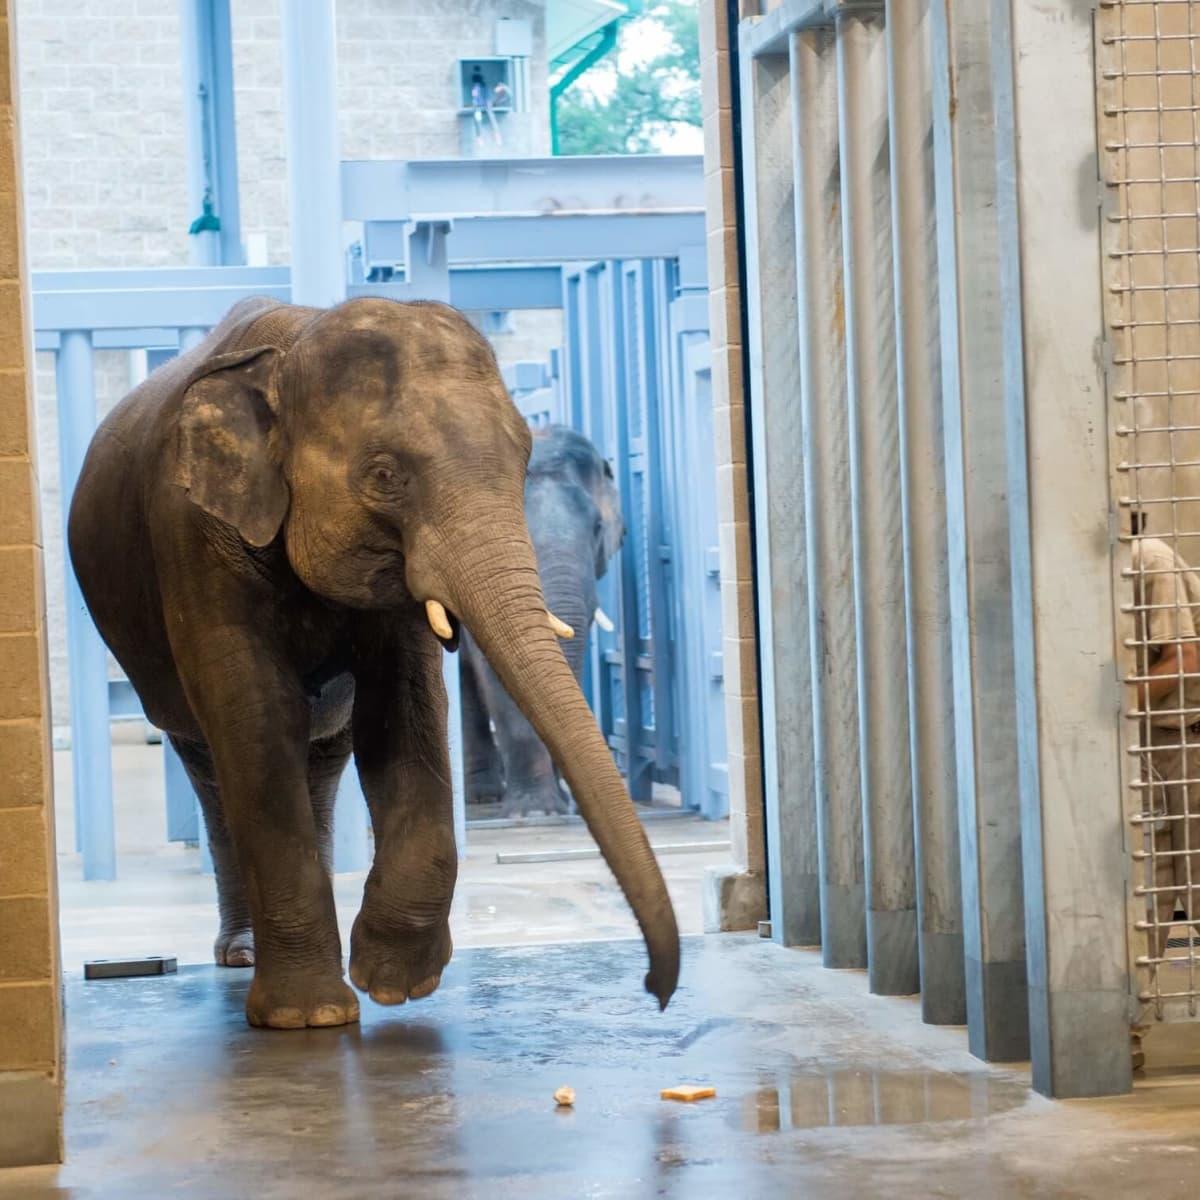 Houston Zoo's Male Elephants Move Into New Barn